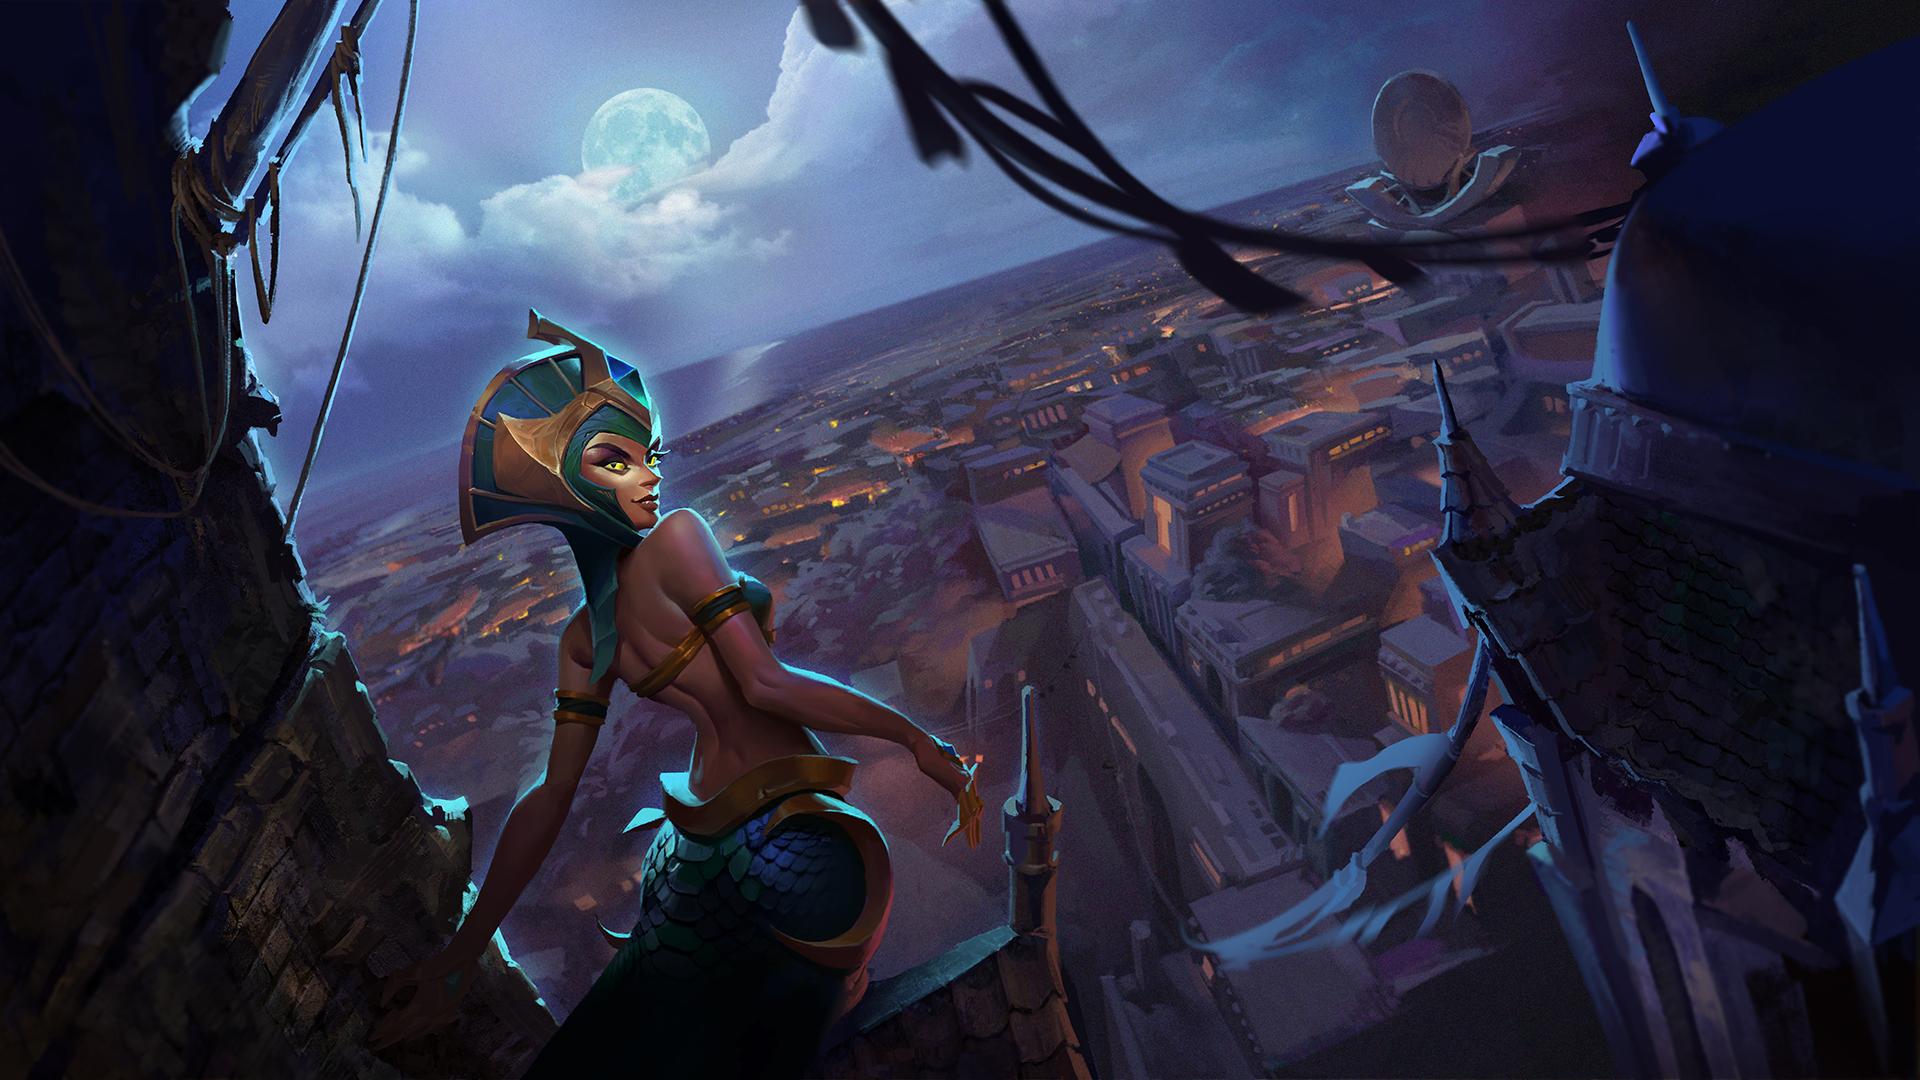 blanco lechoso Negociar comerciante  Cassiopeia - Leaguepedia | League of Legends Esports Wiki